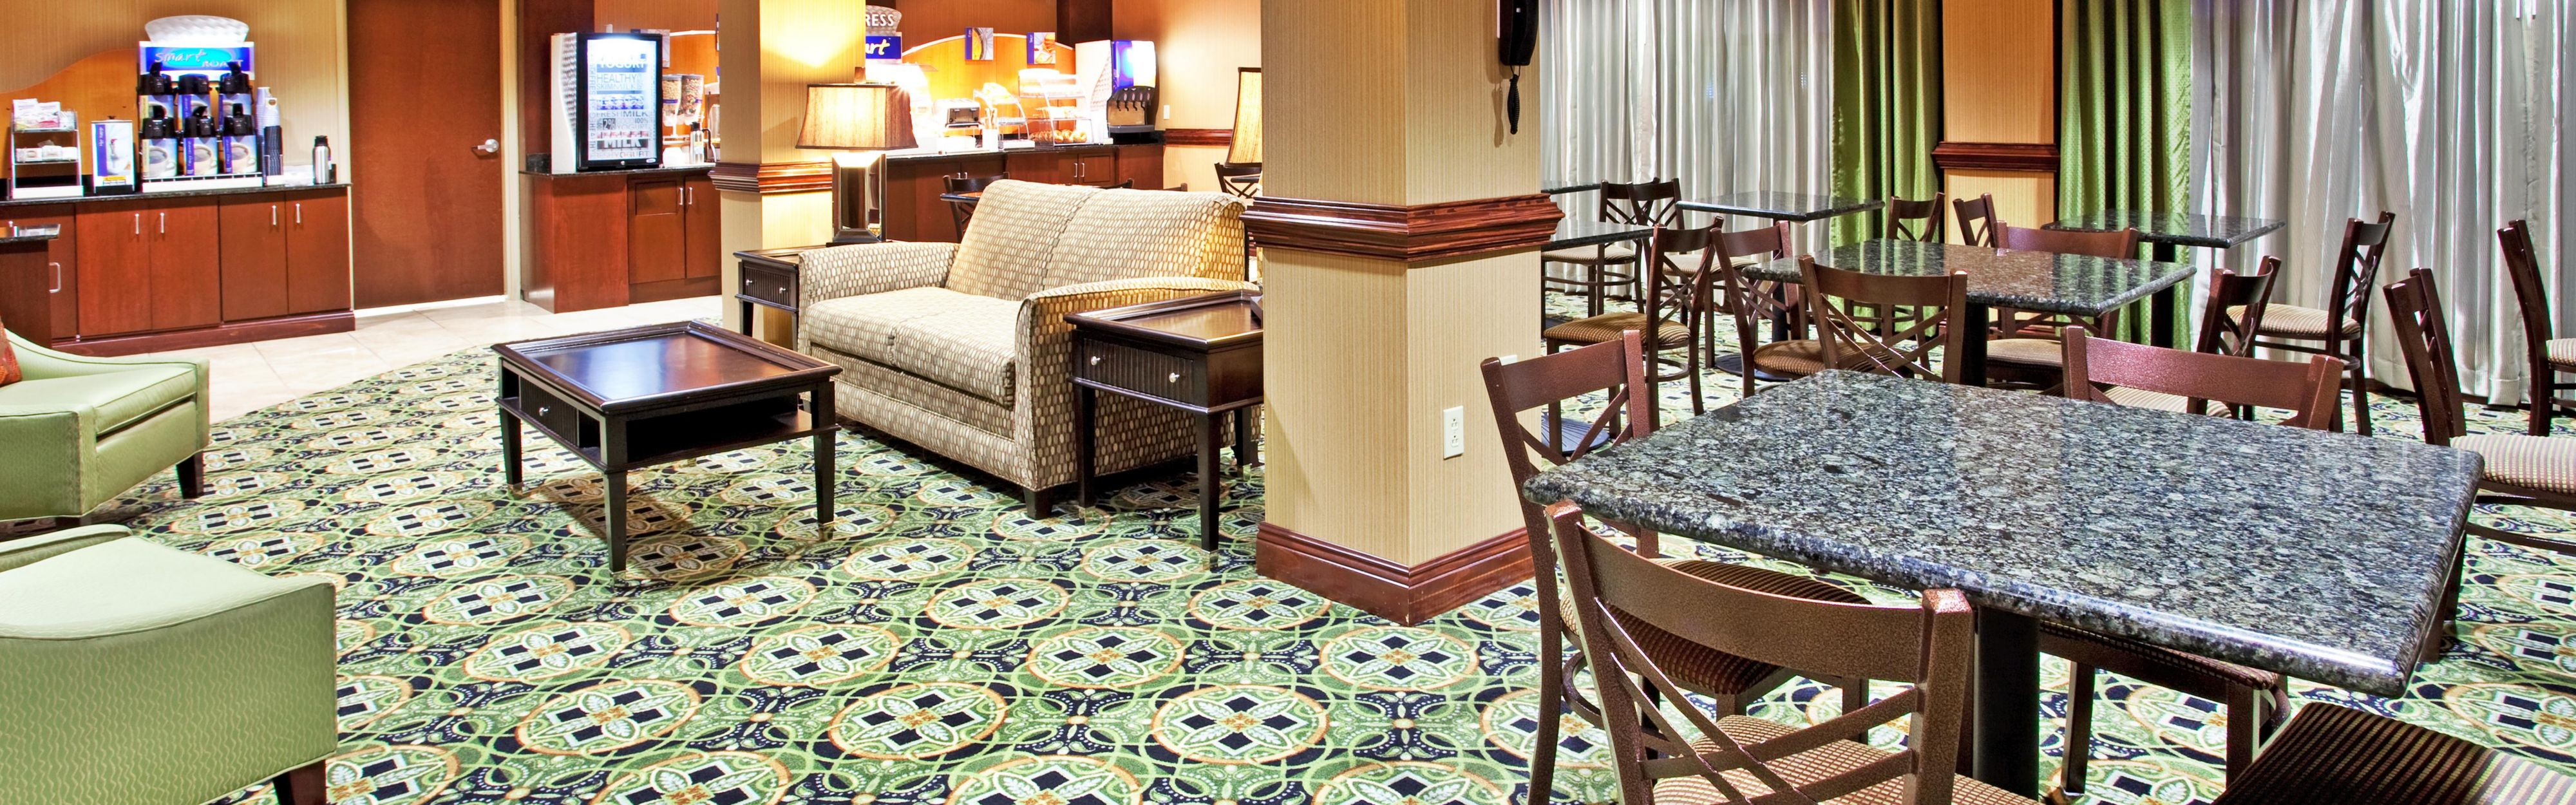 Holiday Inn Express & Suites Biloxi- Ocean Springs image 3